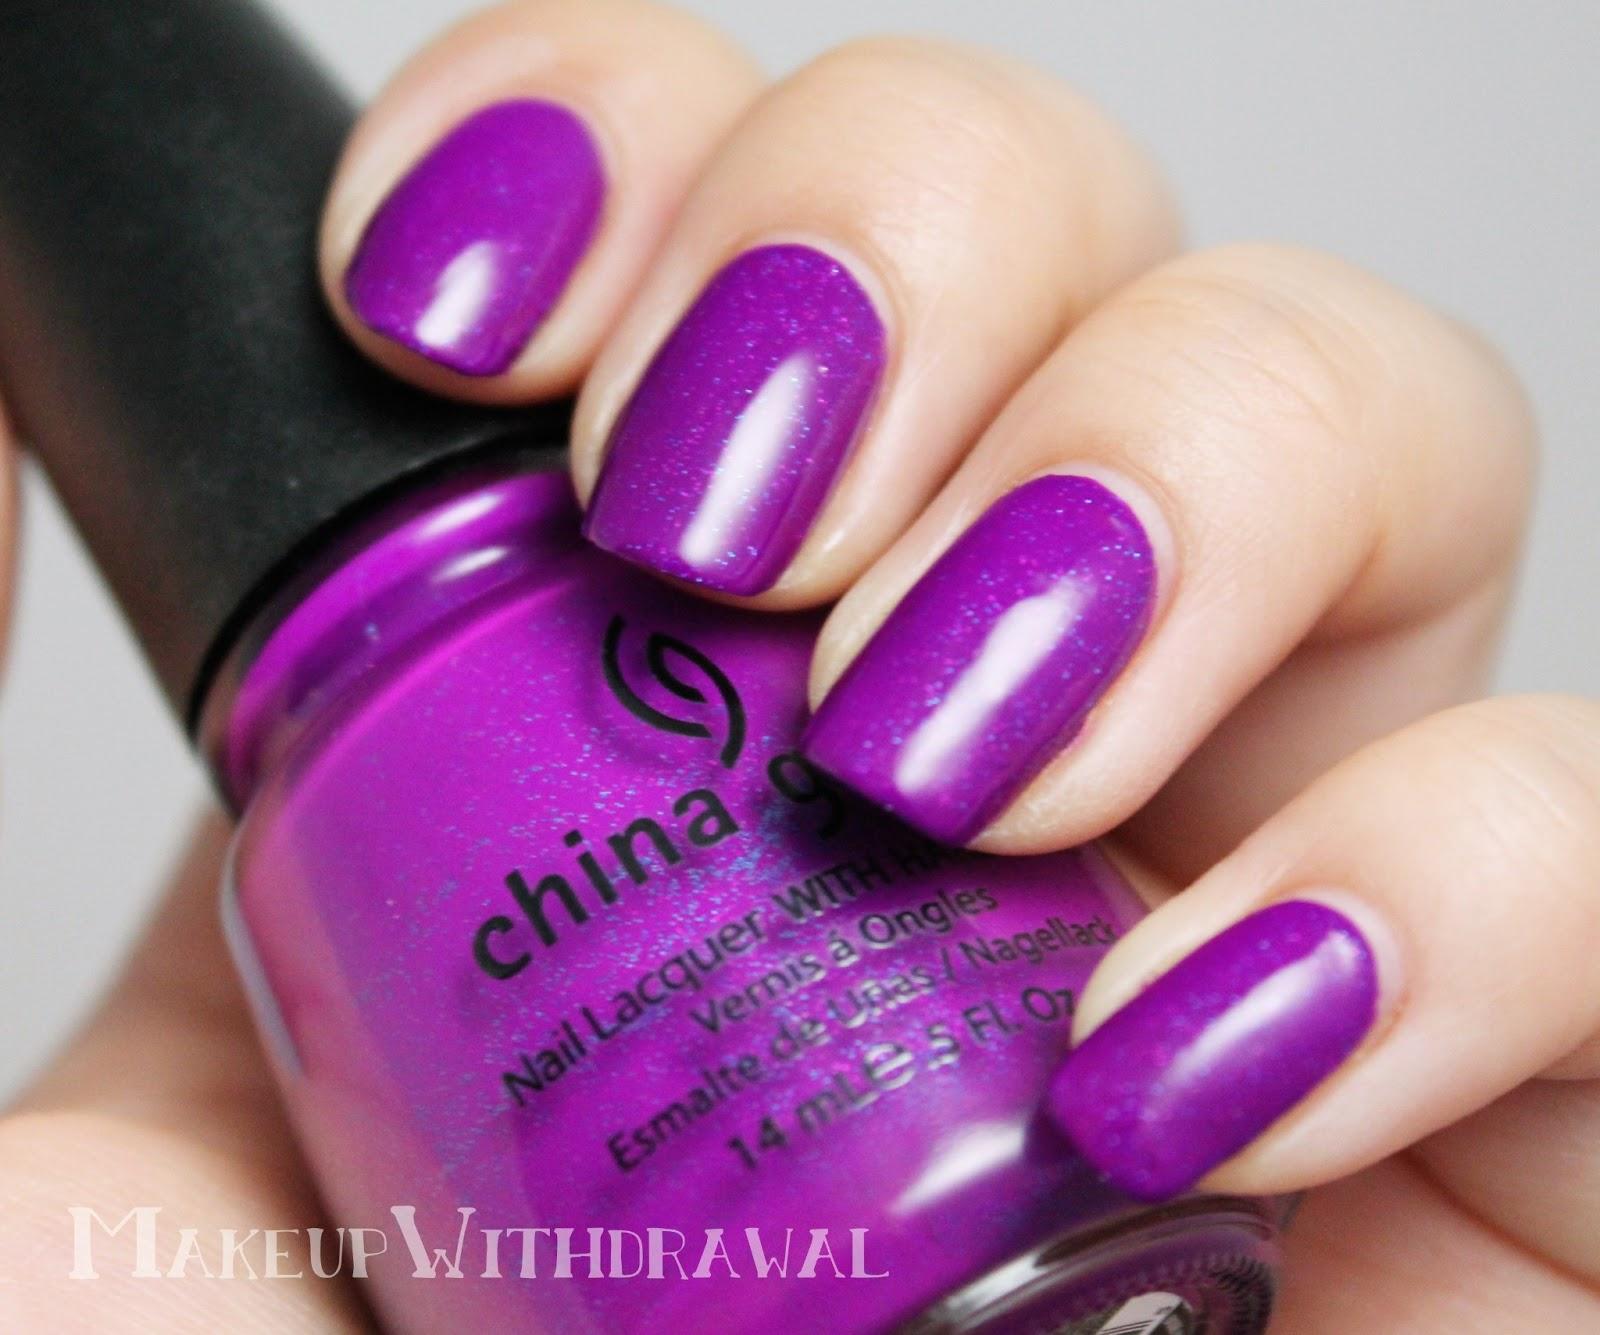 Purple Polish Spam Makeup Withdrawal